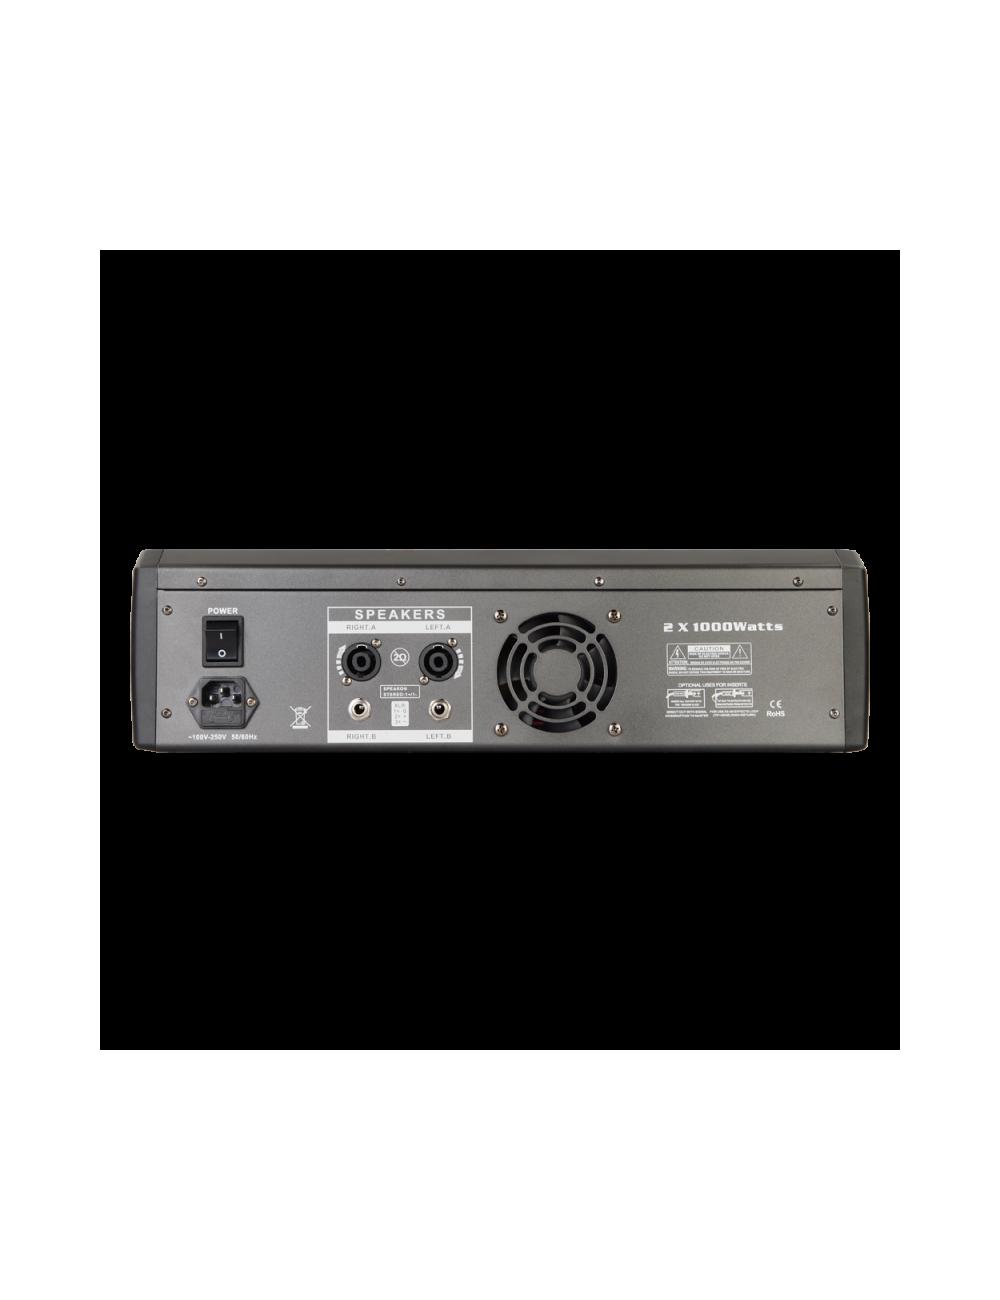 KRK KNS-8400 Δυναμικά Ακουστικά